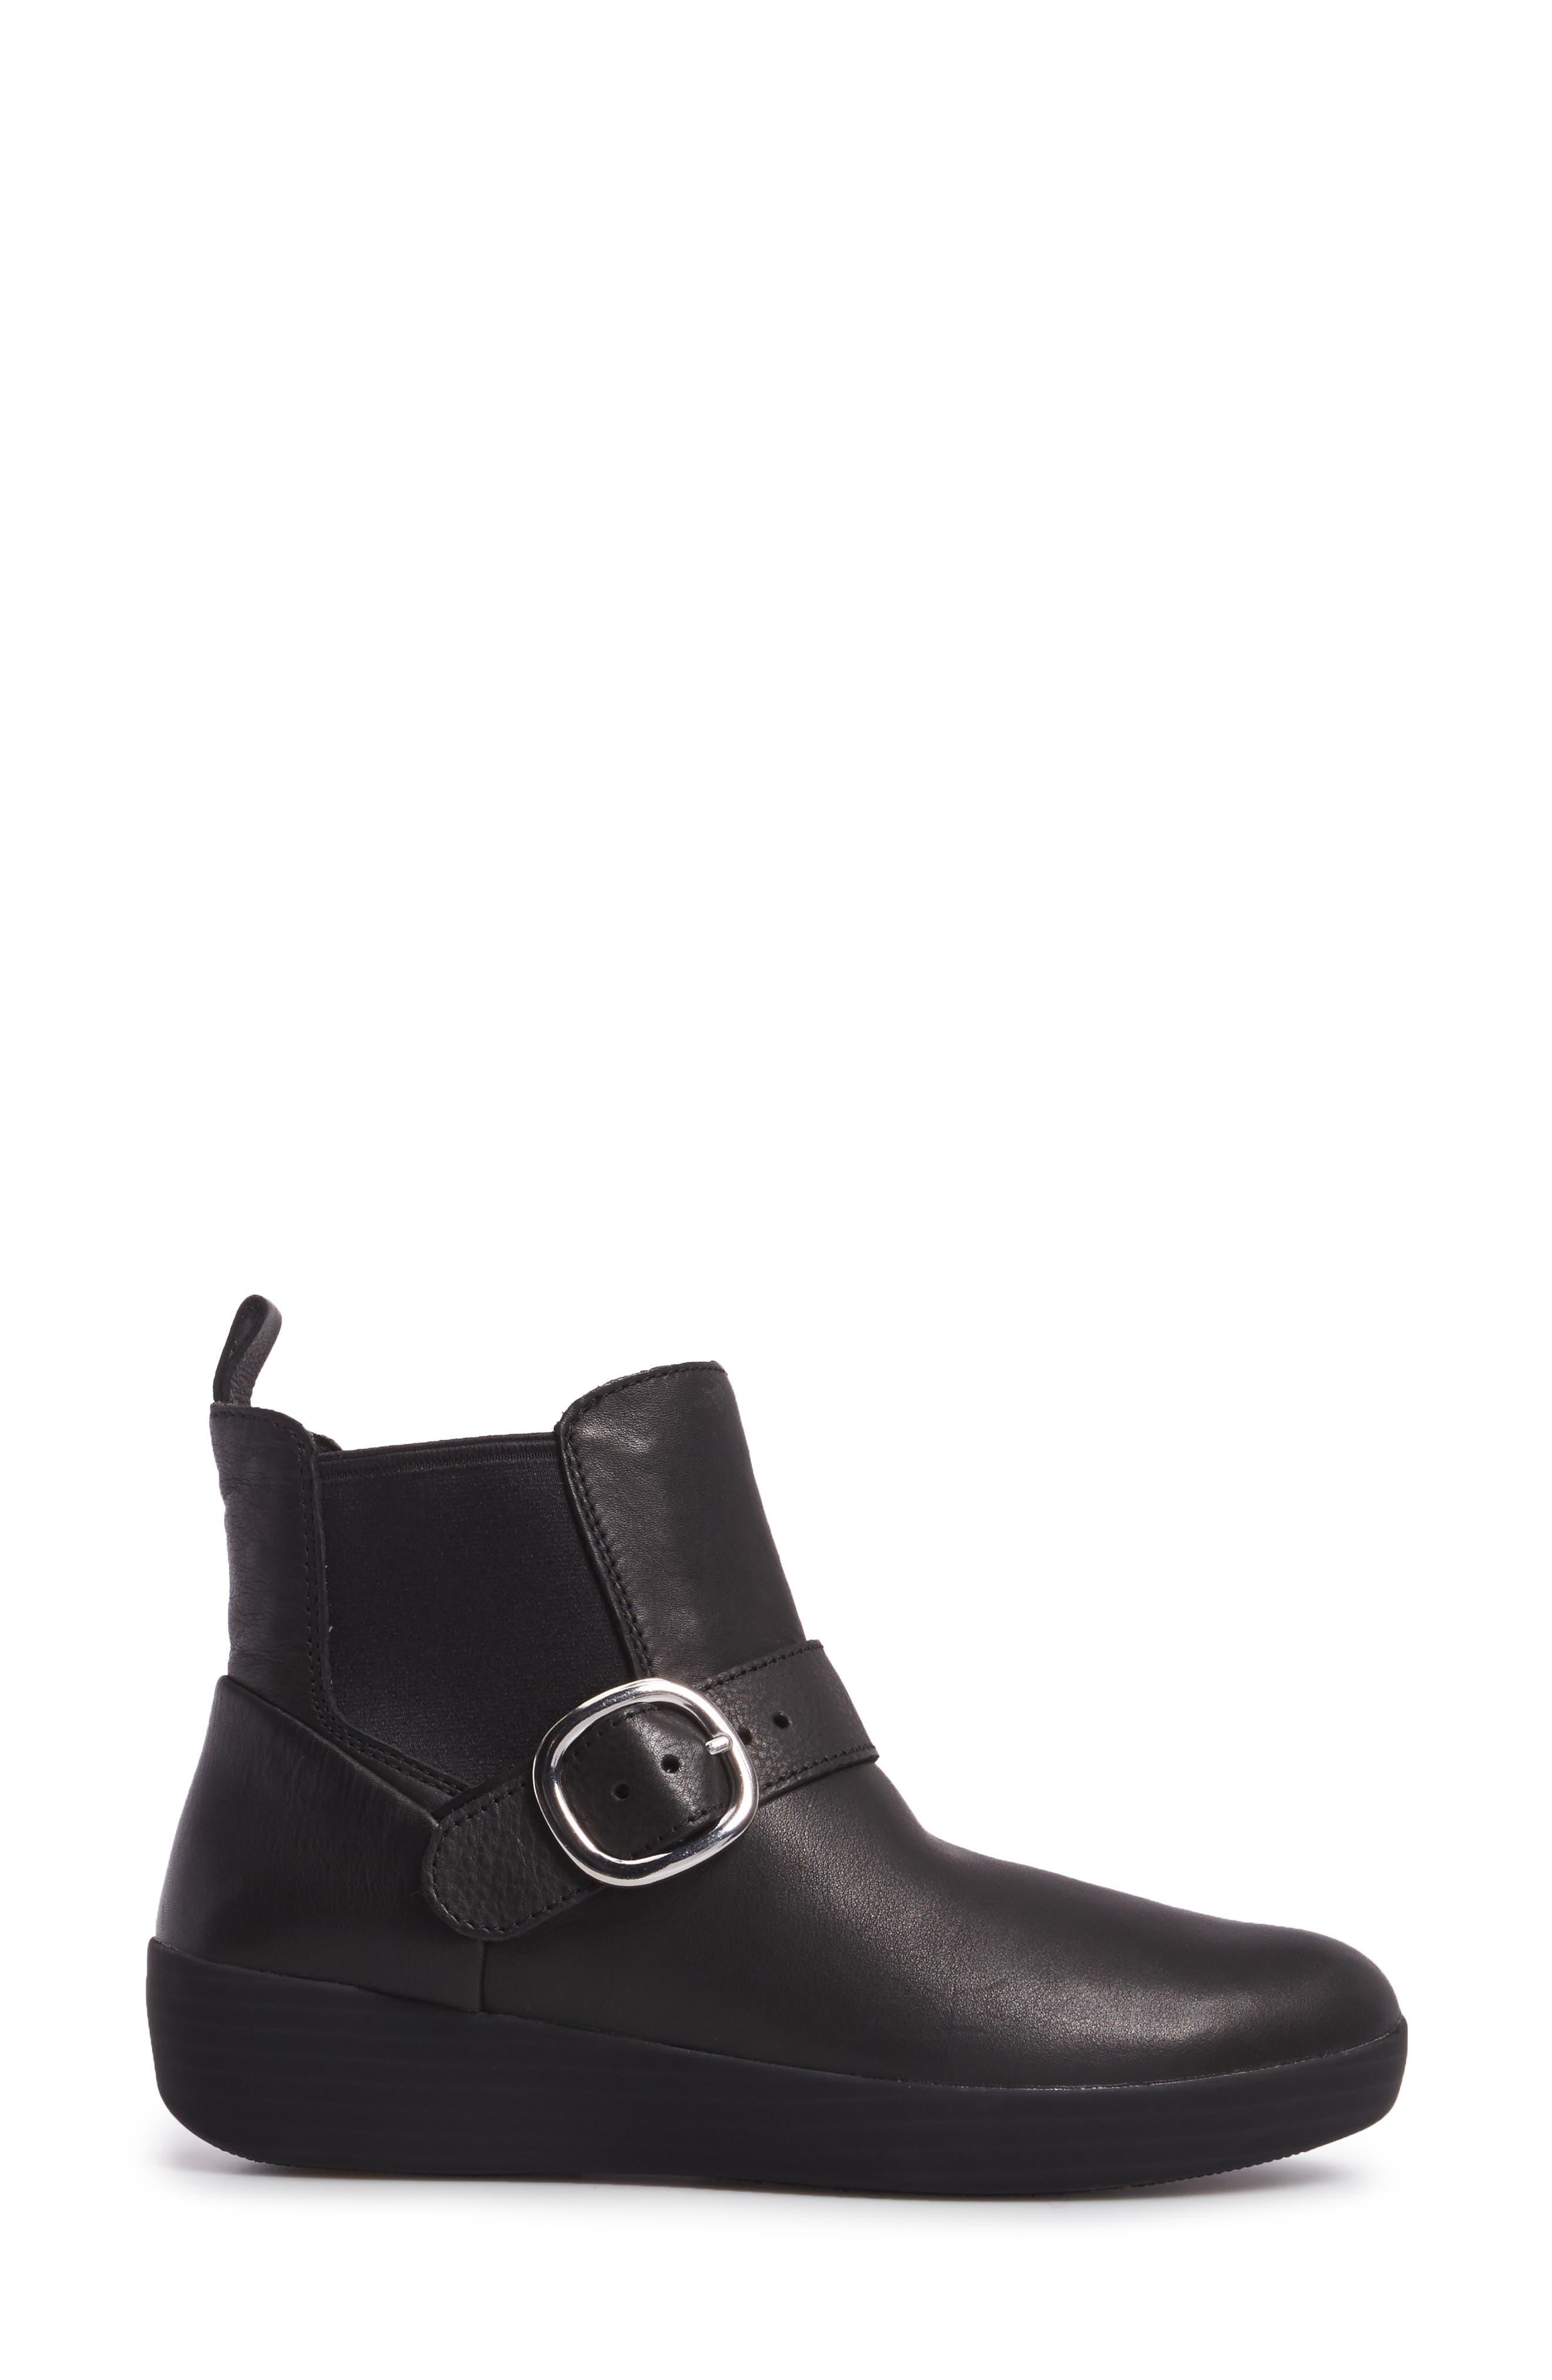 Superbuckle Chelsea Boot,                             Alternate thumbnail 3, color,                             Black